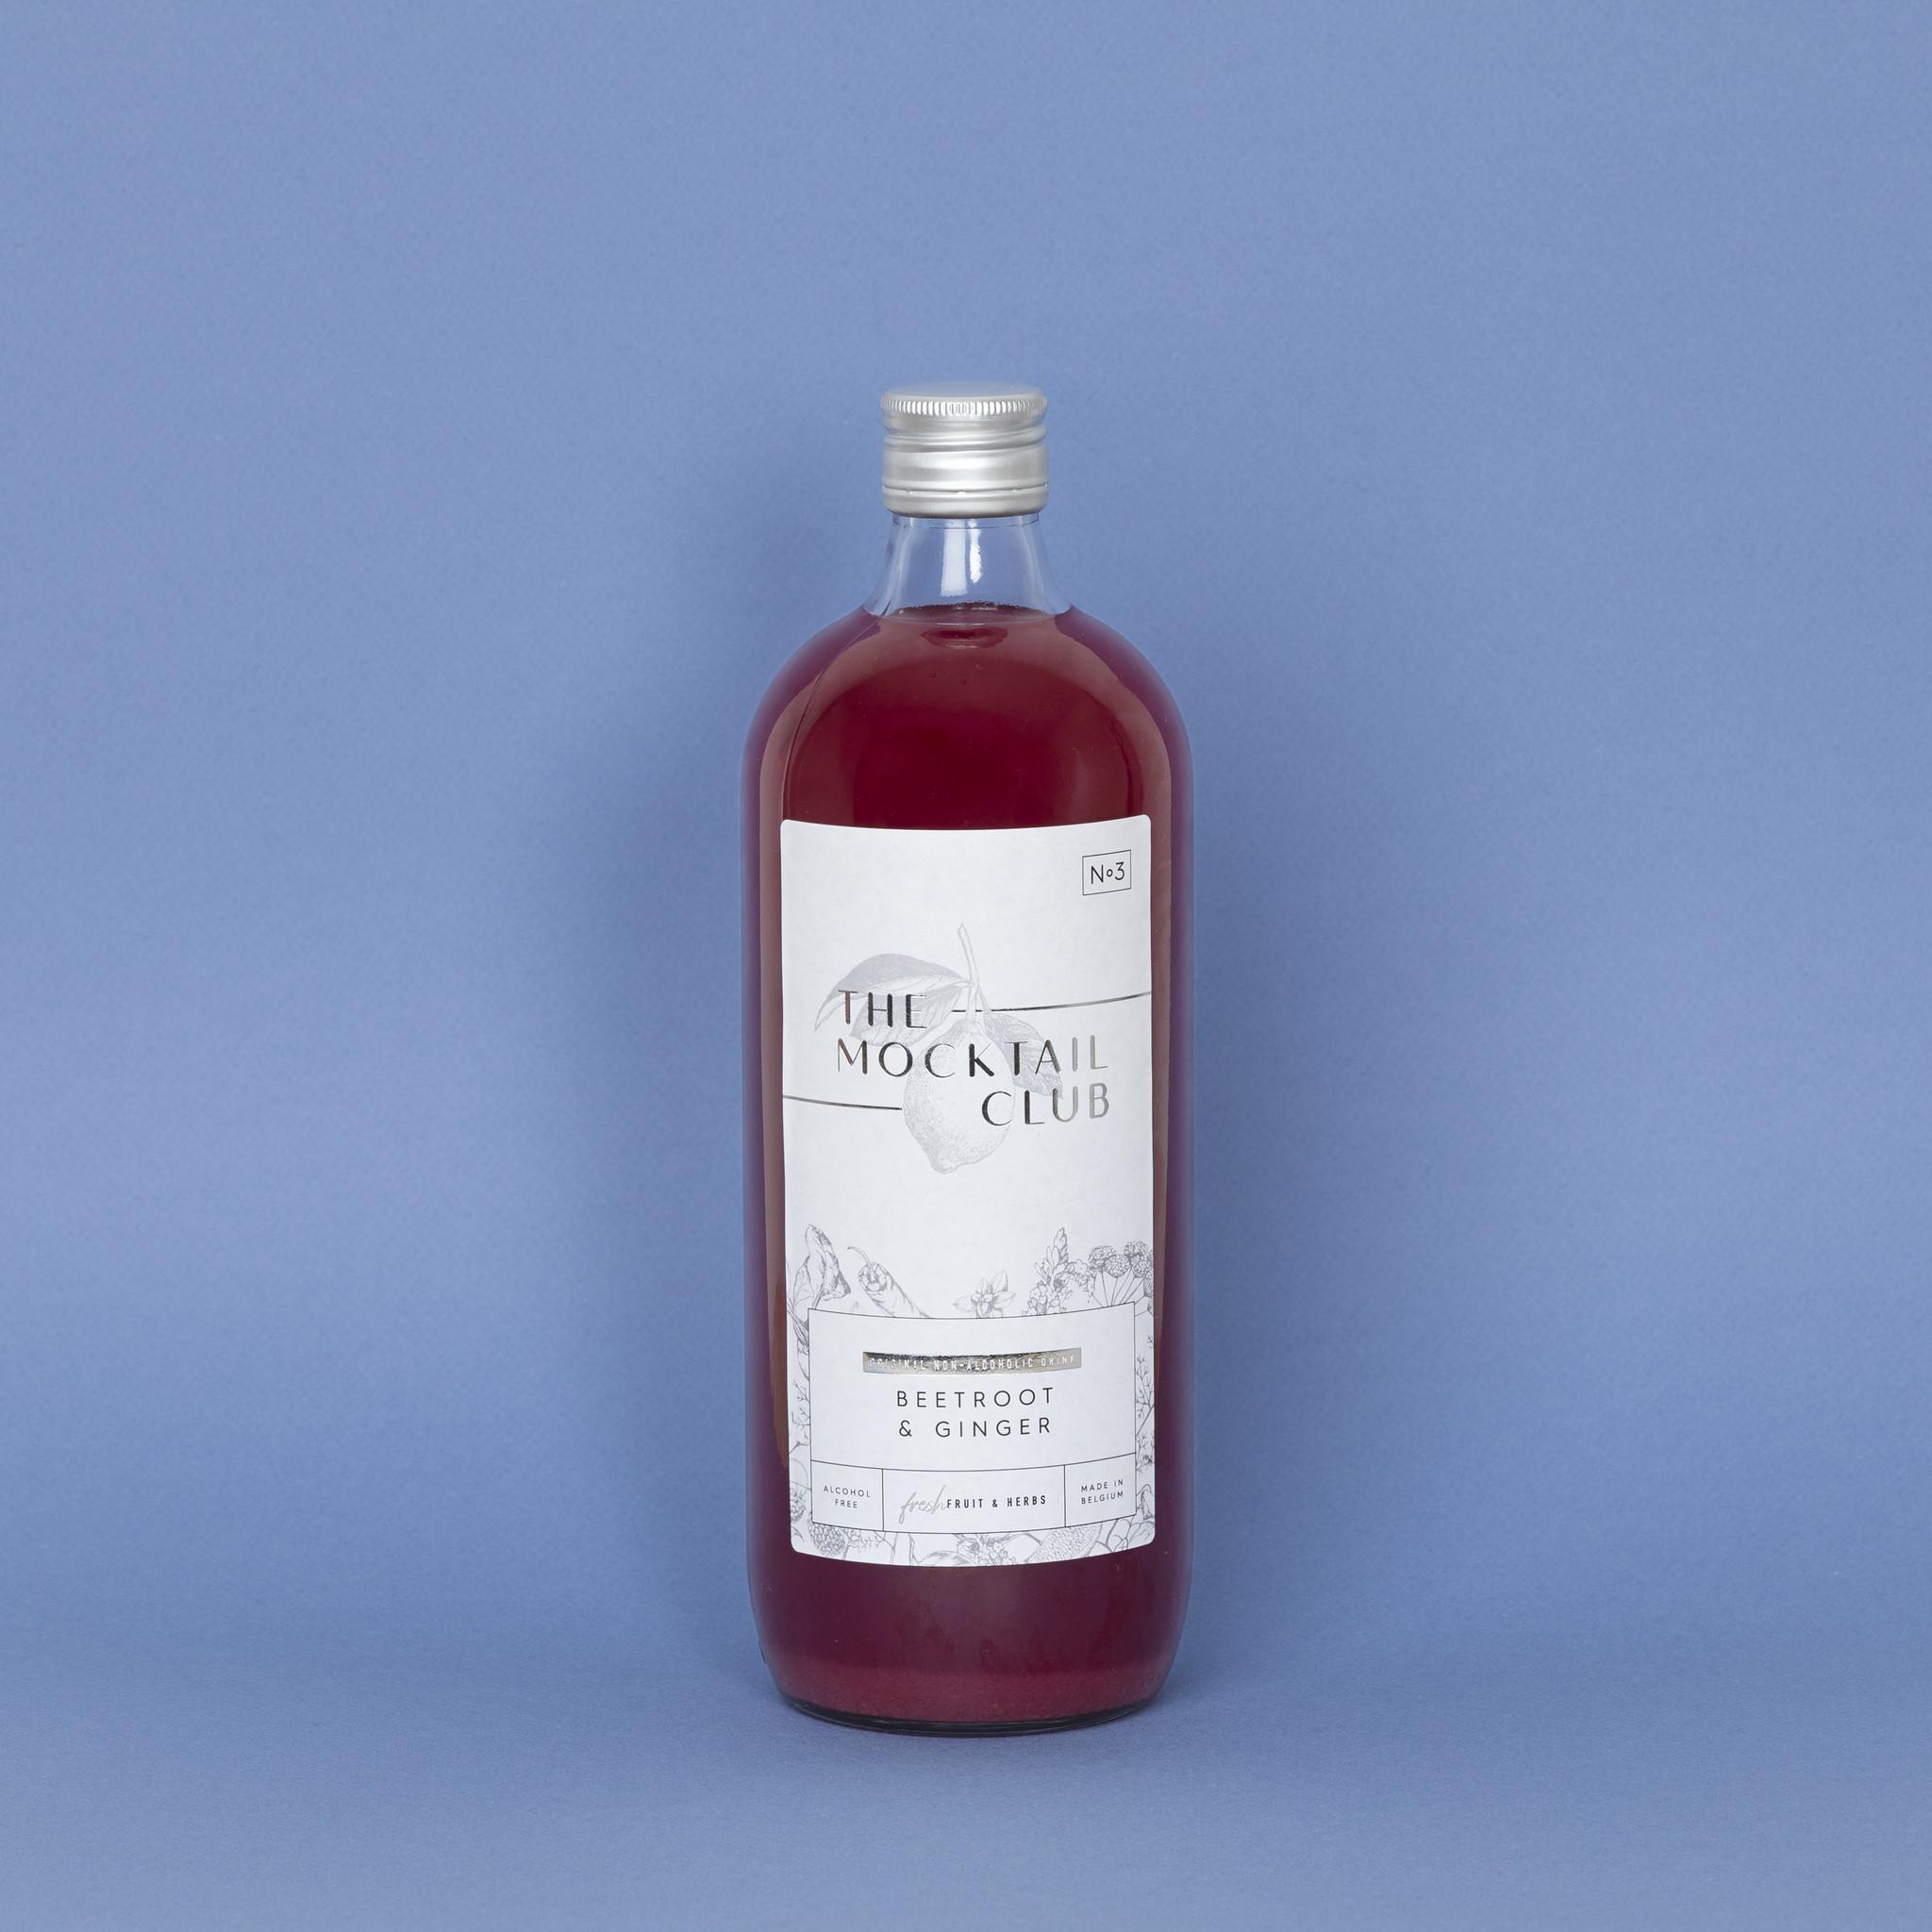 The Mocktail Club Beetroot & Ginger 1L